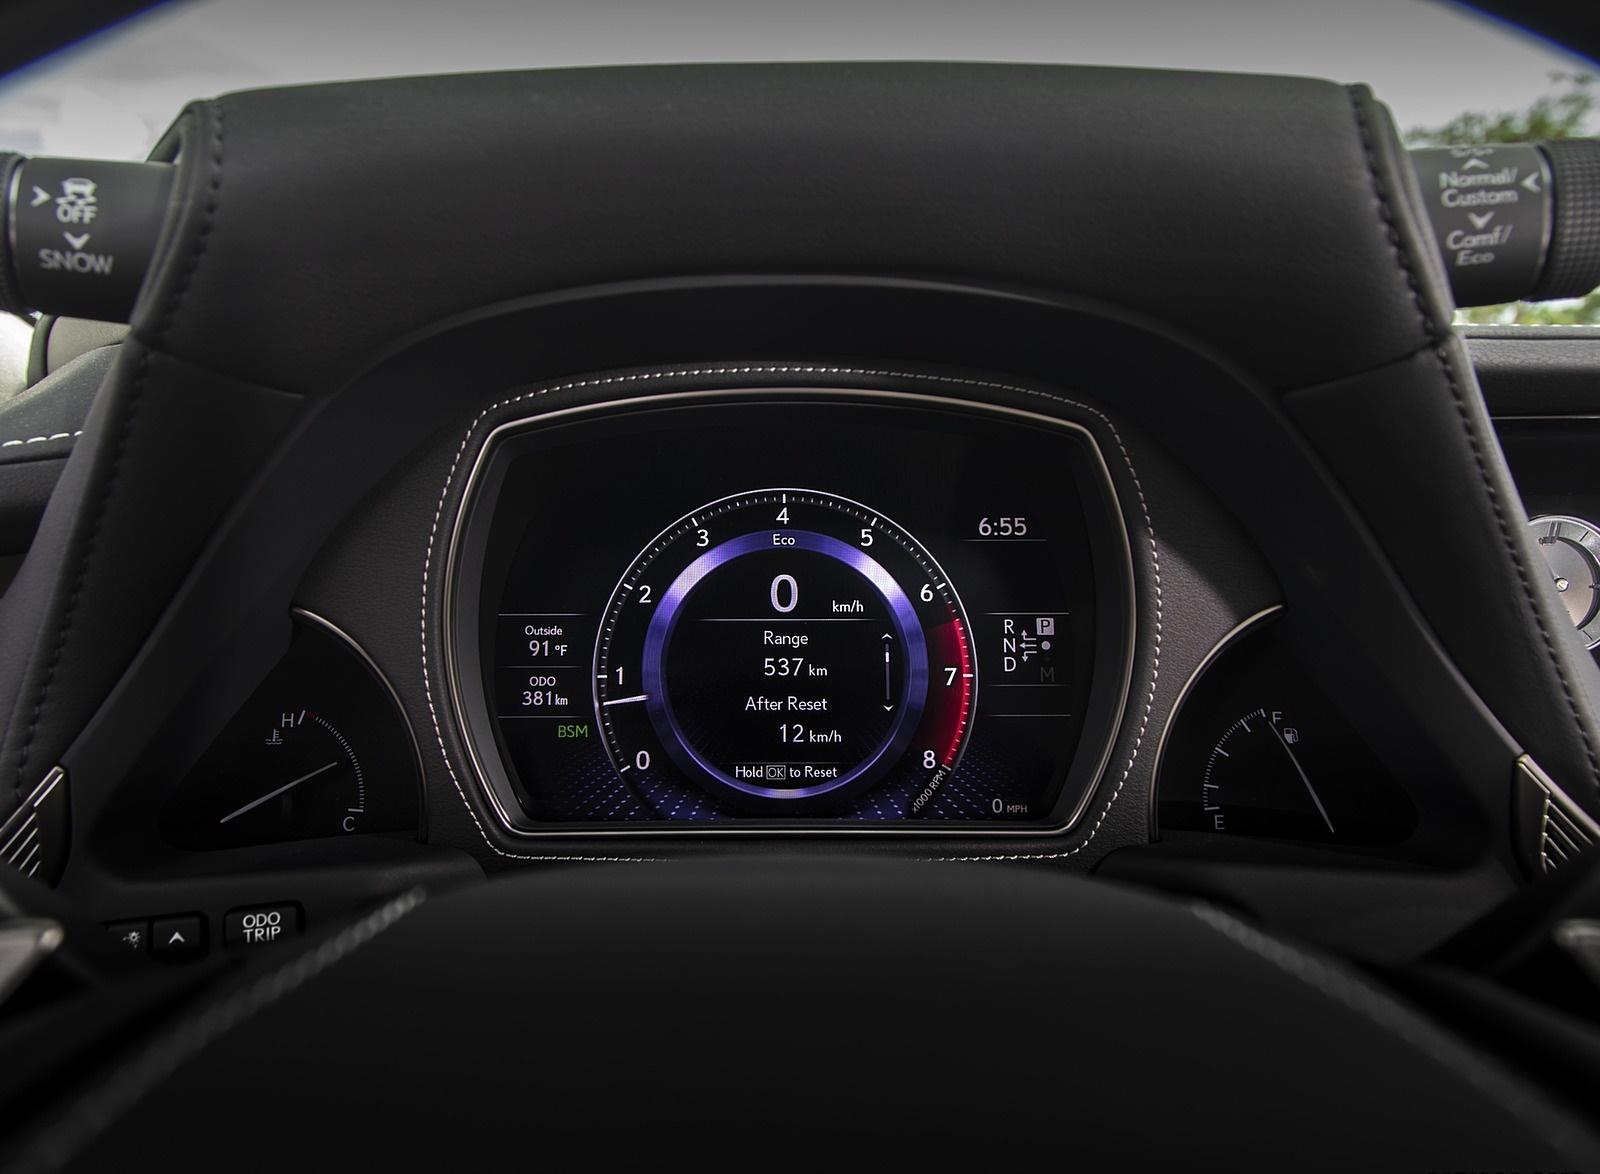 2020 Lexus LS 500 Inspiration Series Digital Instrument Cluster Wallpapers (12)